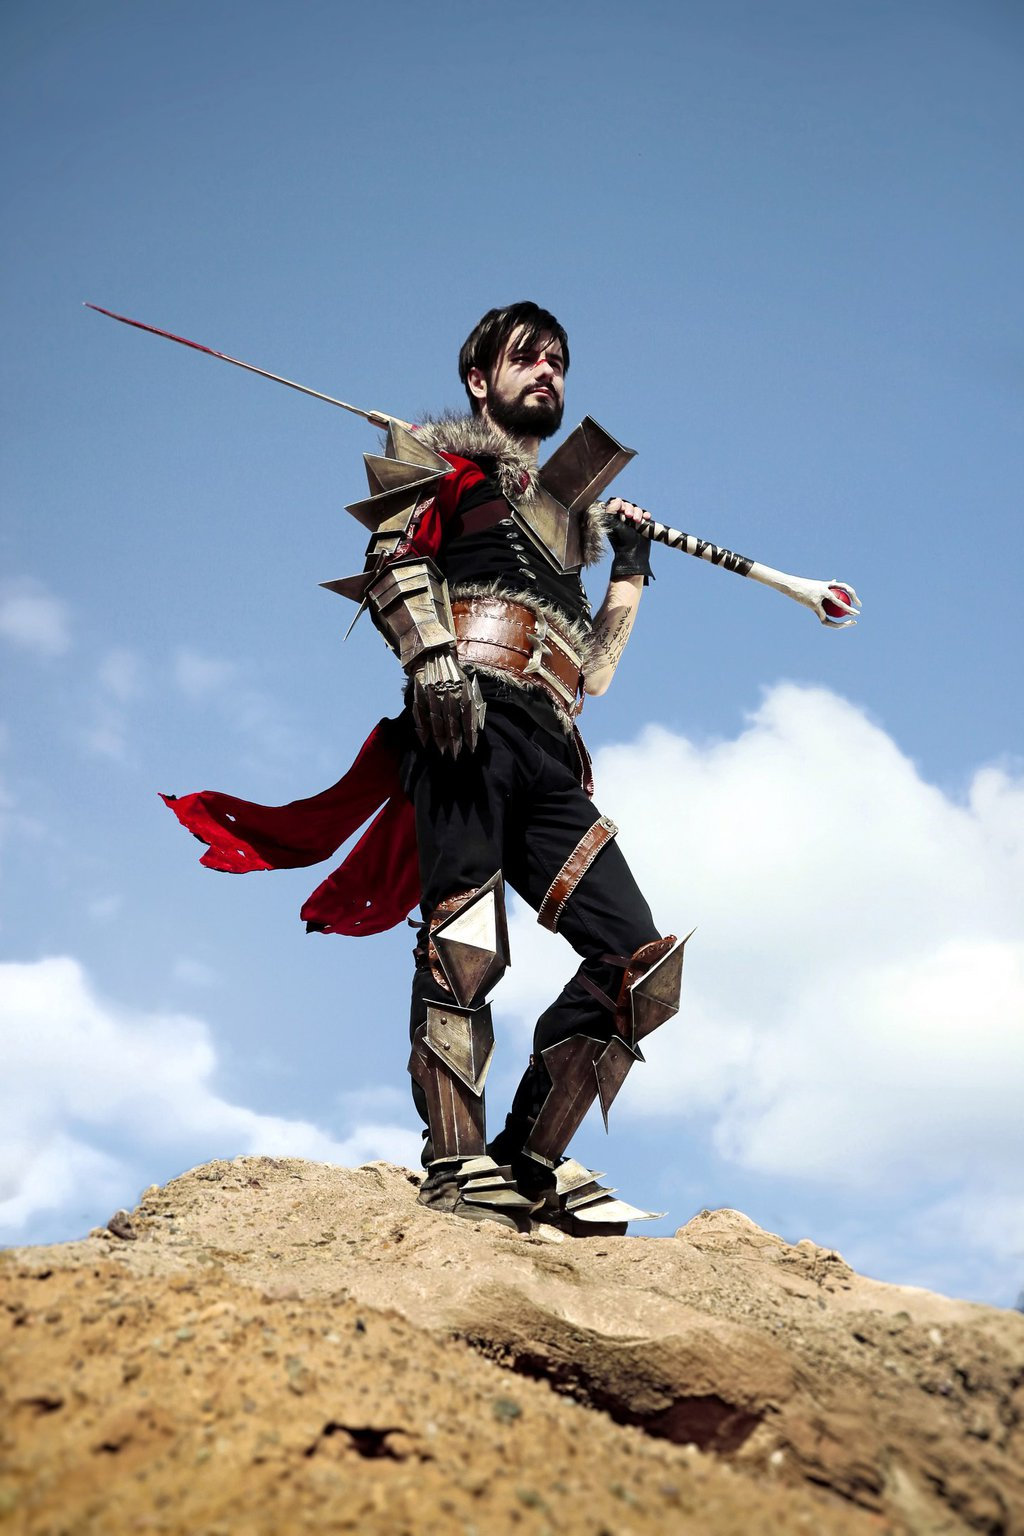 Хоук-DA-персонажи-Dragon-Age-фэндомы-3140503.jpeg - Dragon Age 2 Dragon Age cosplay, Хоук